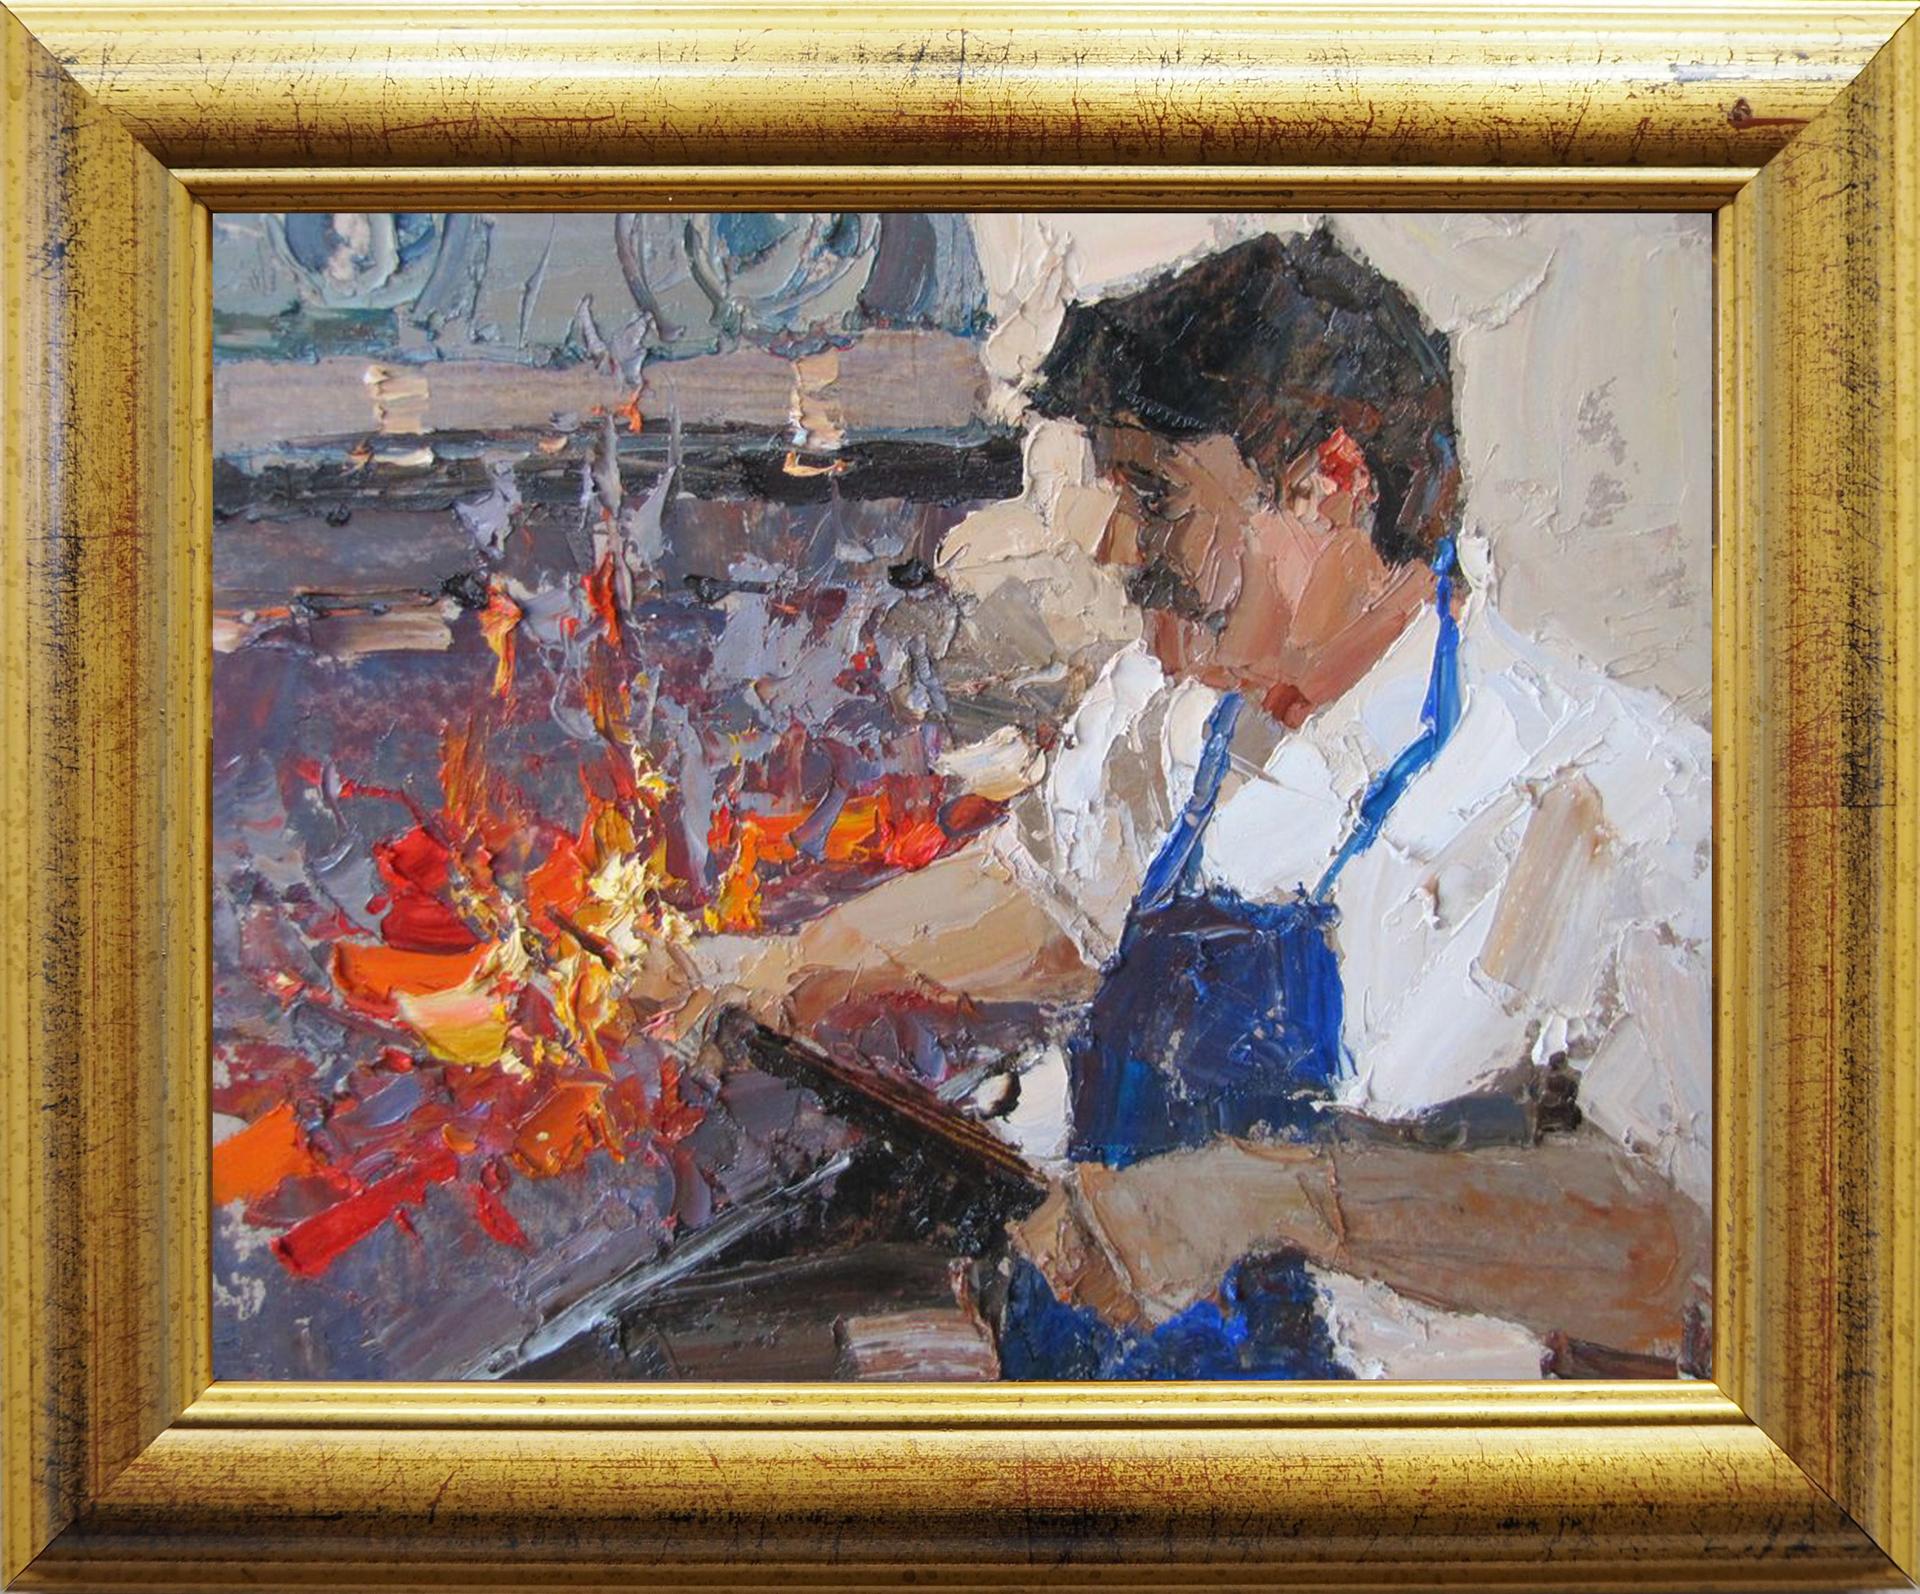 On Coals by Daniil Volkov